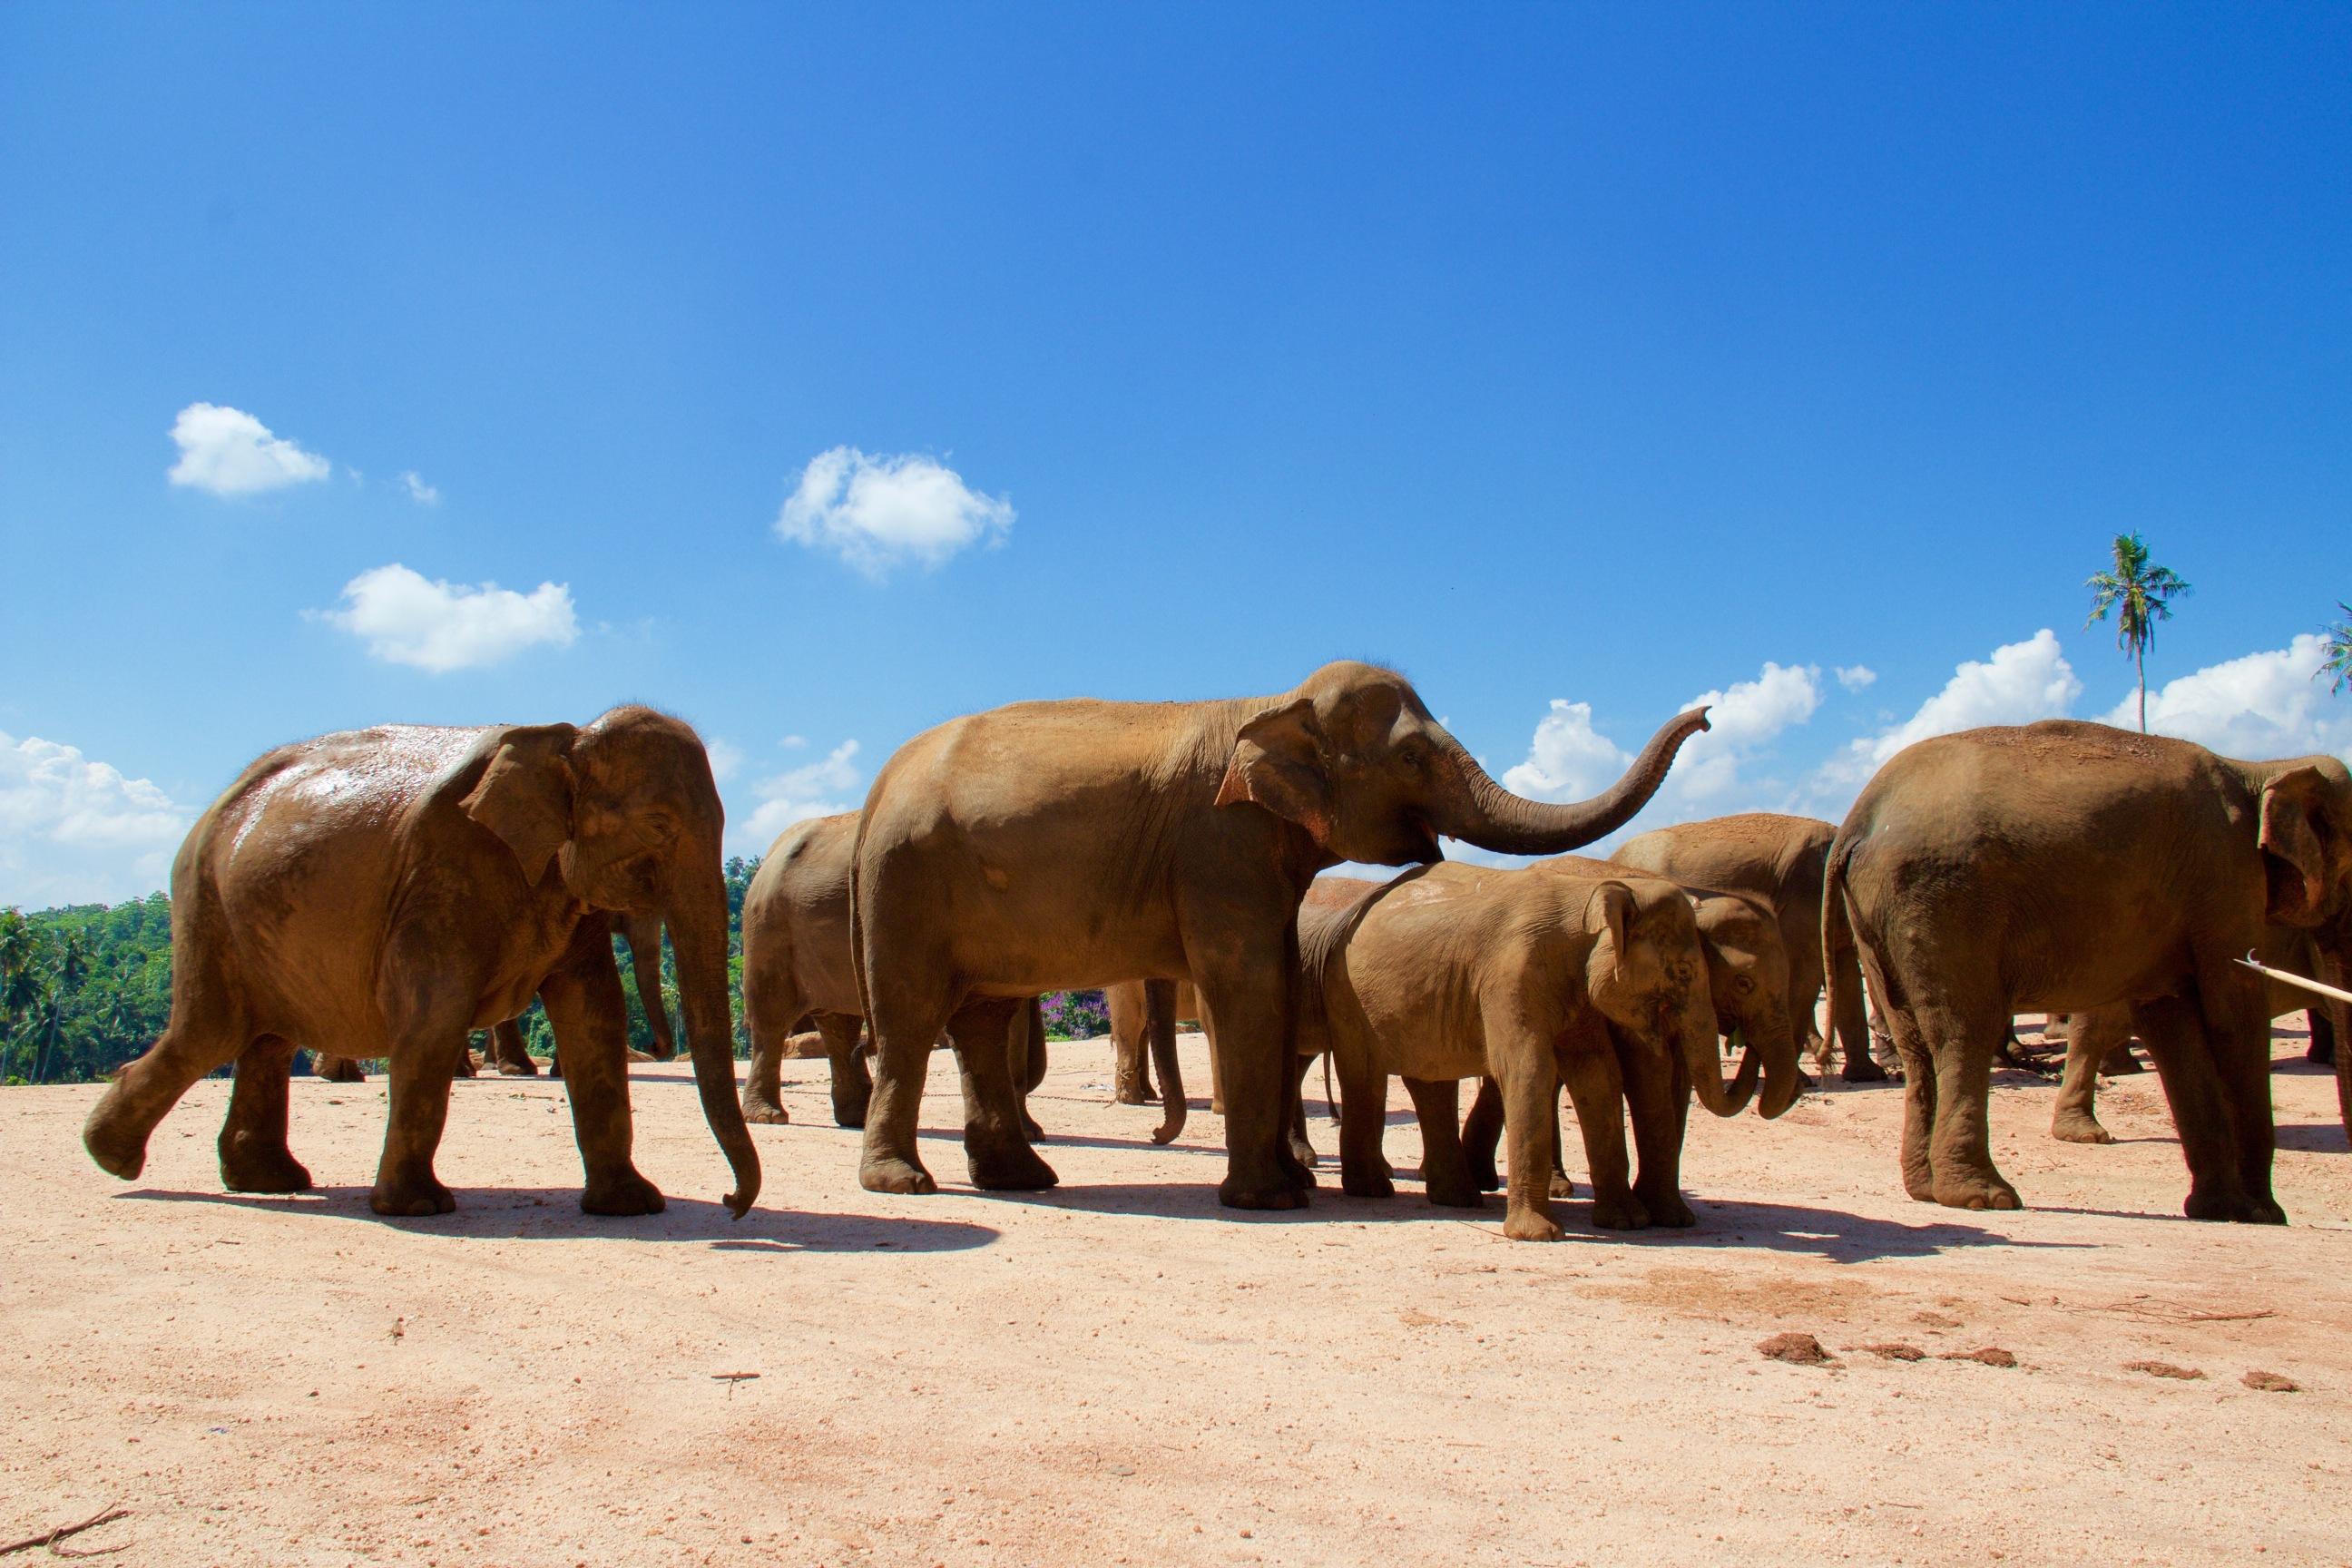 Elephant@SriLanka-2014-05-02